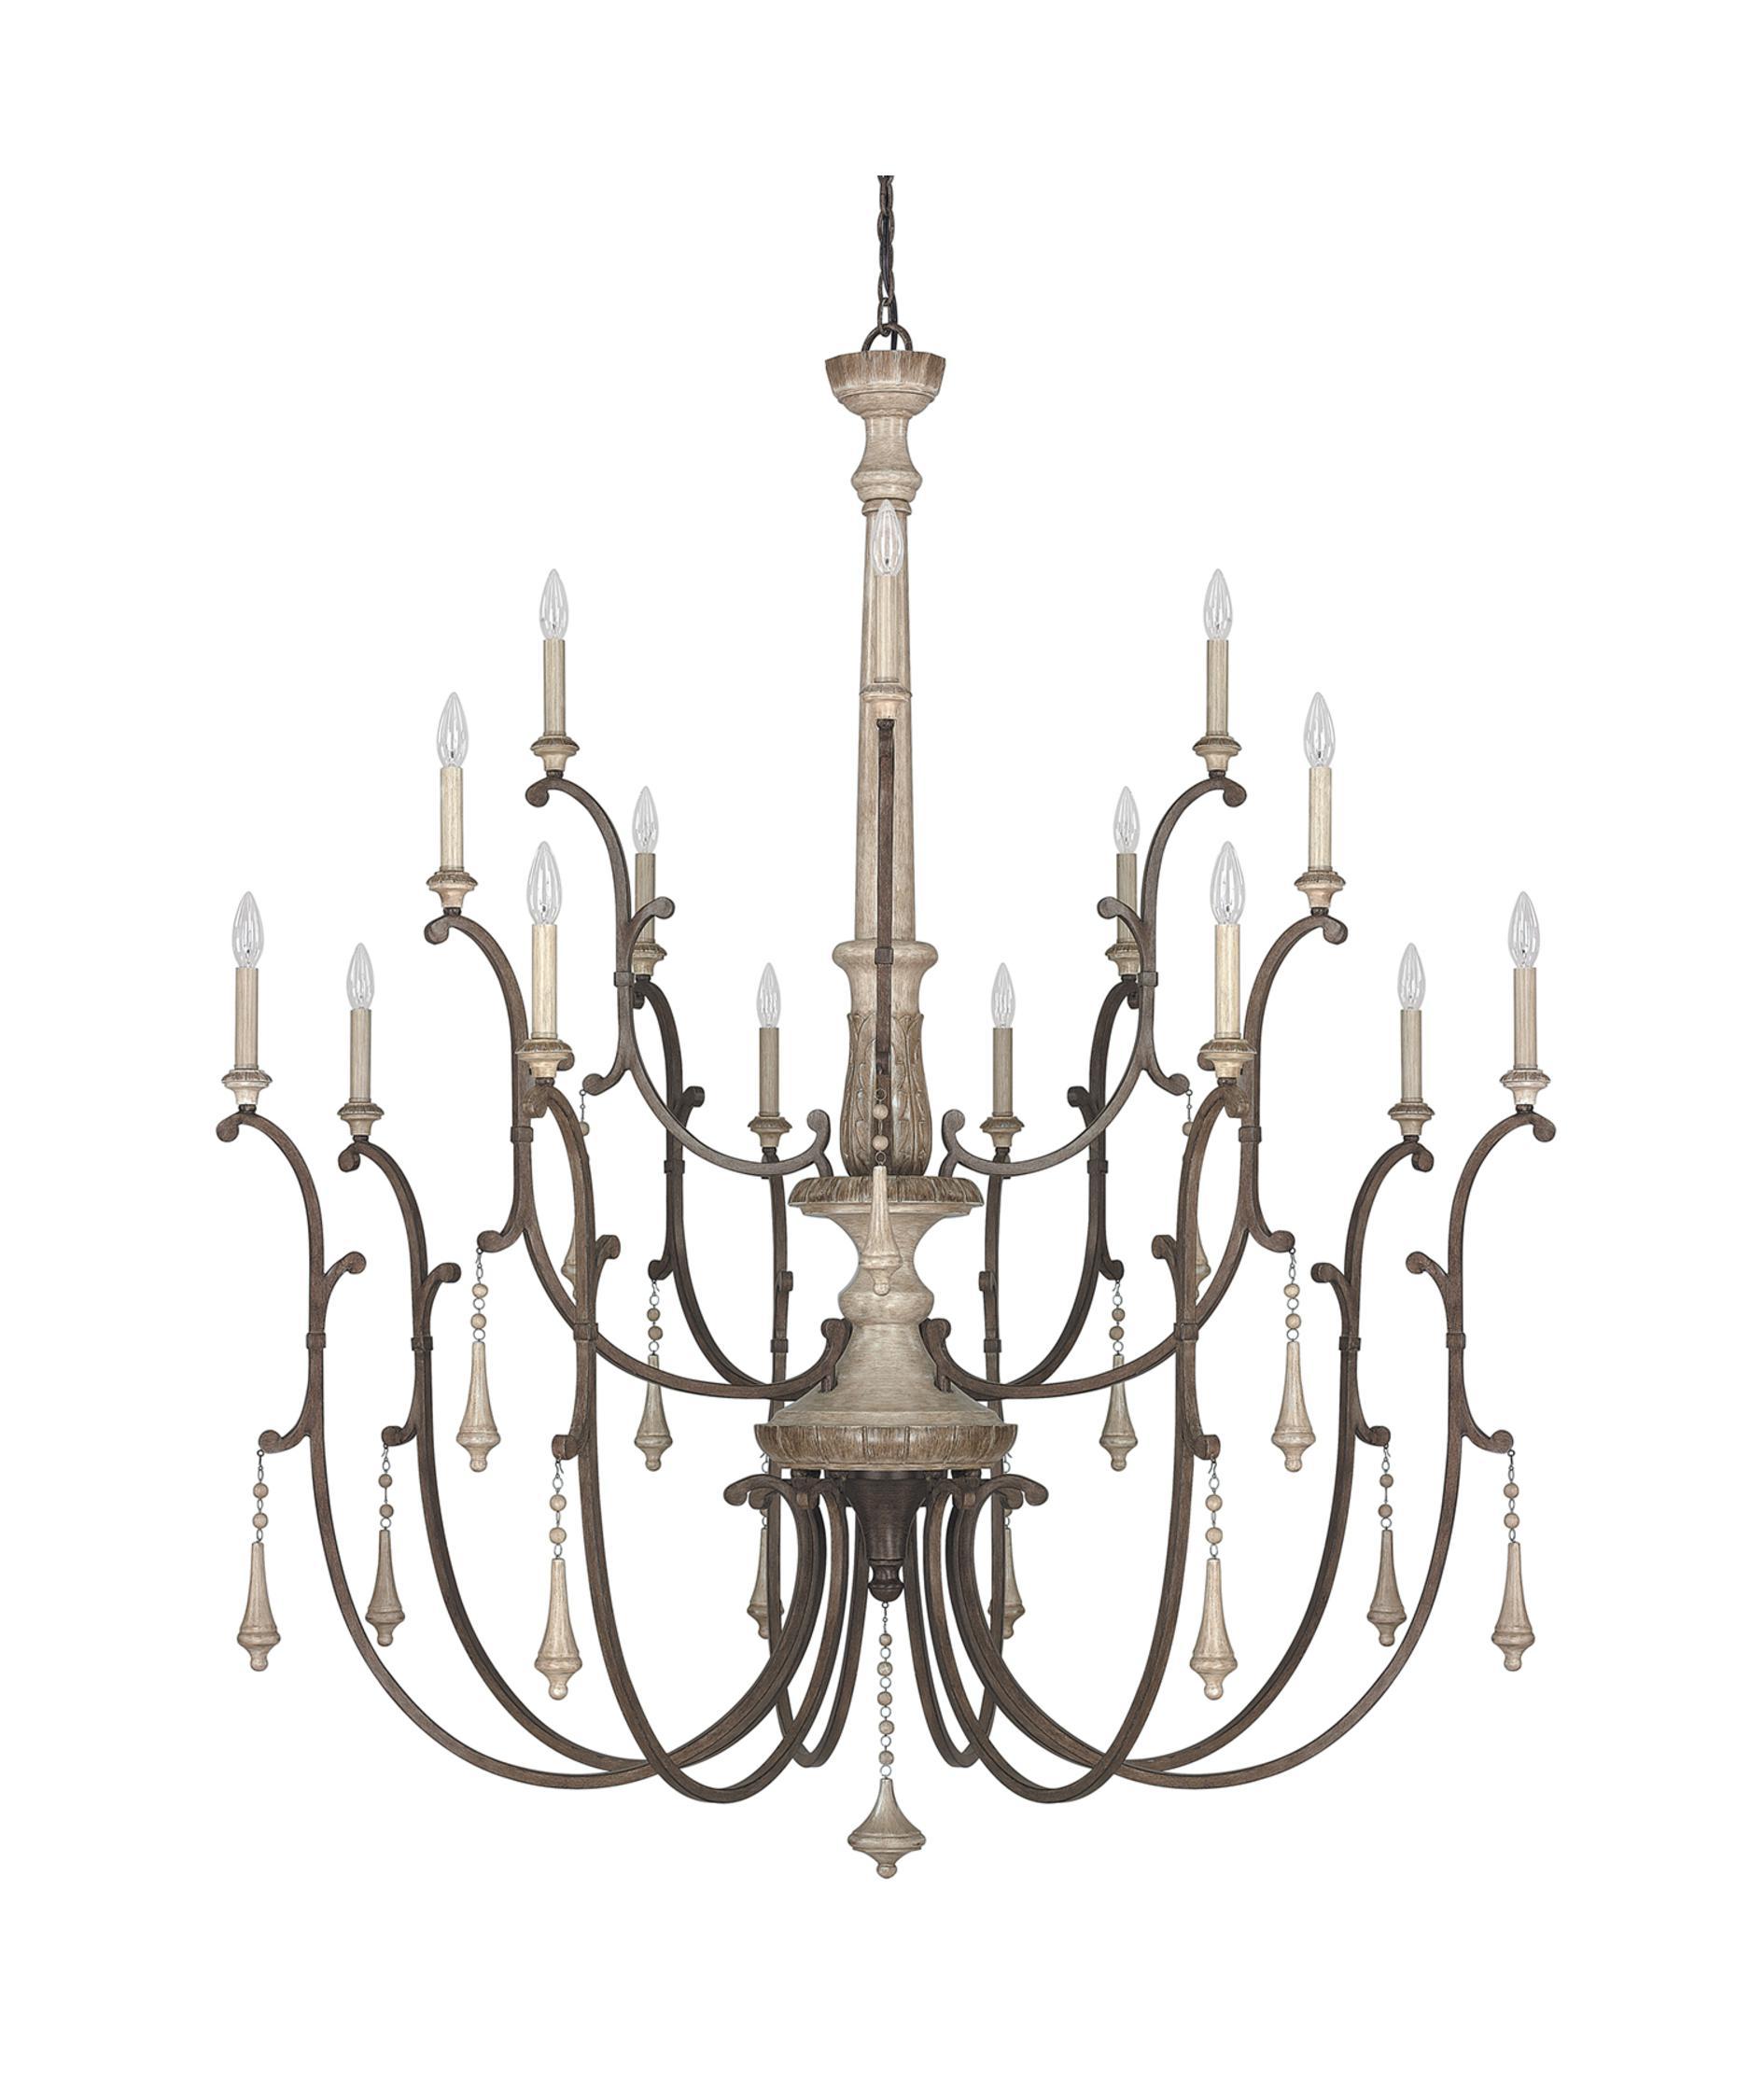 capital lighting chateau 54 inch wide 16 light chandelier capitol lighting - Capital Lighting